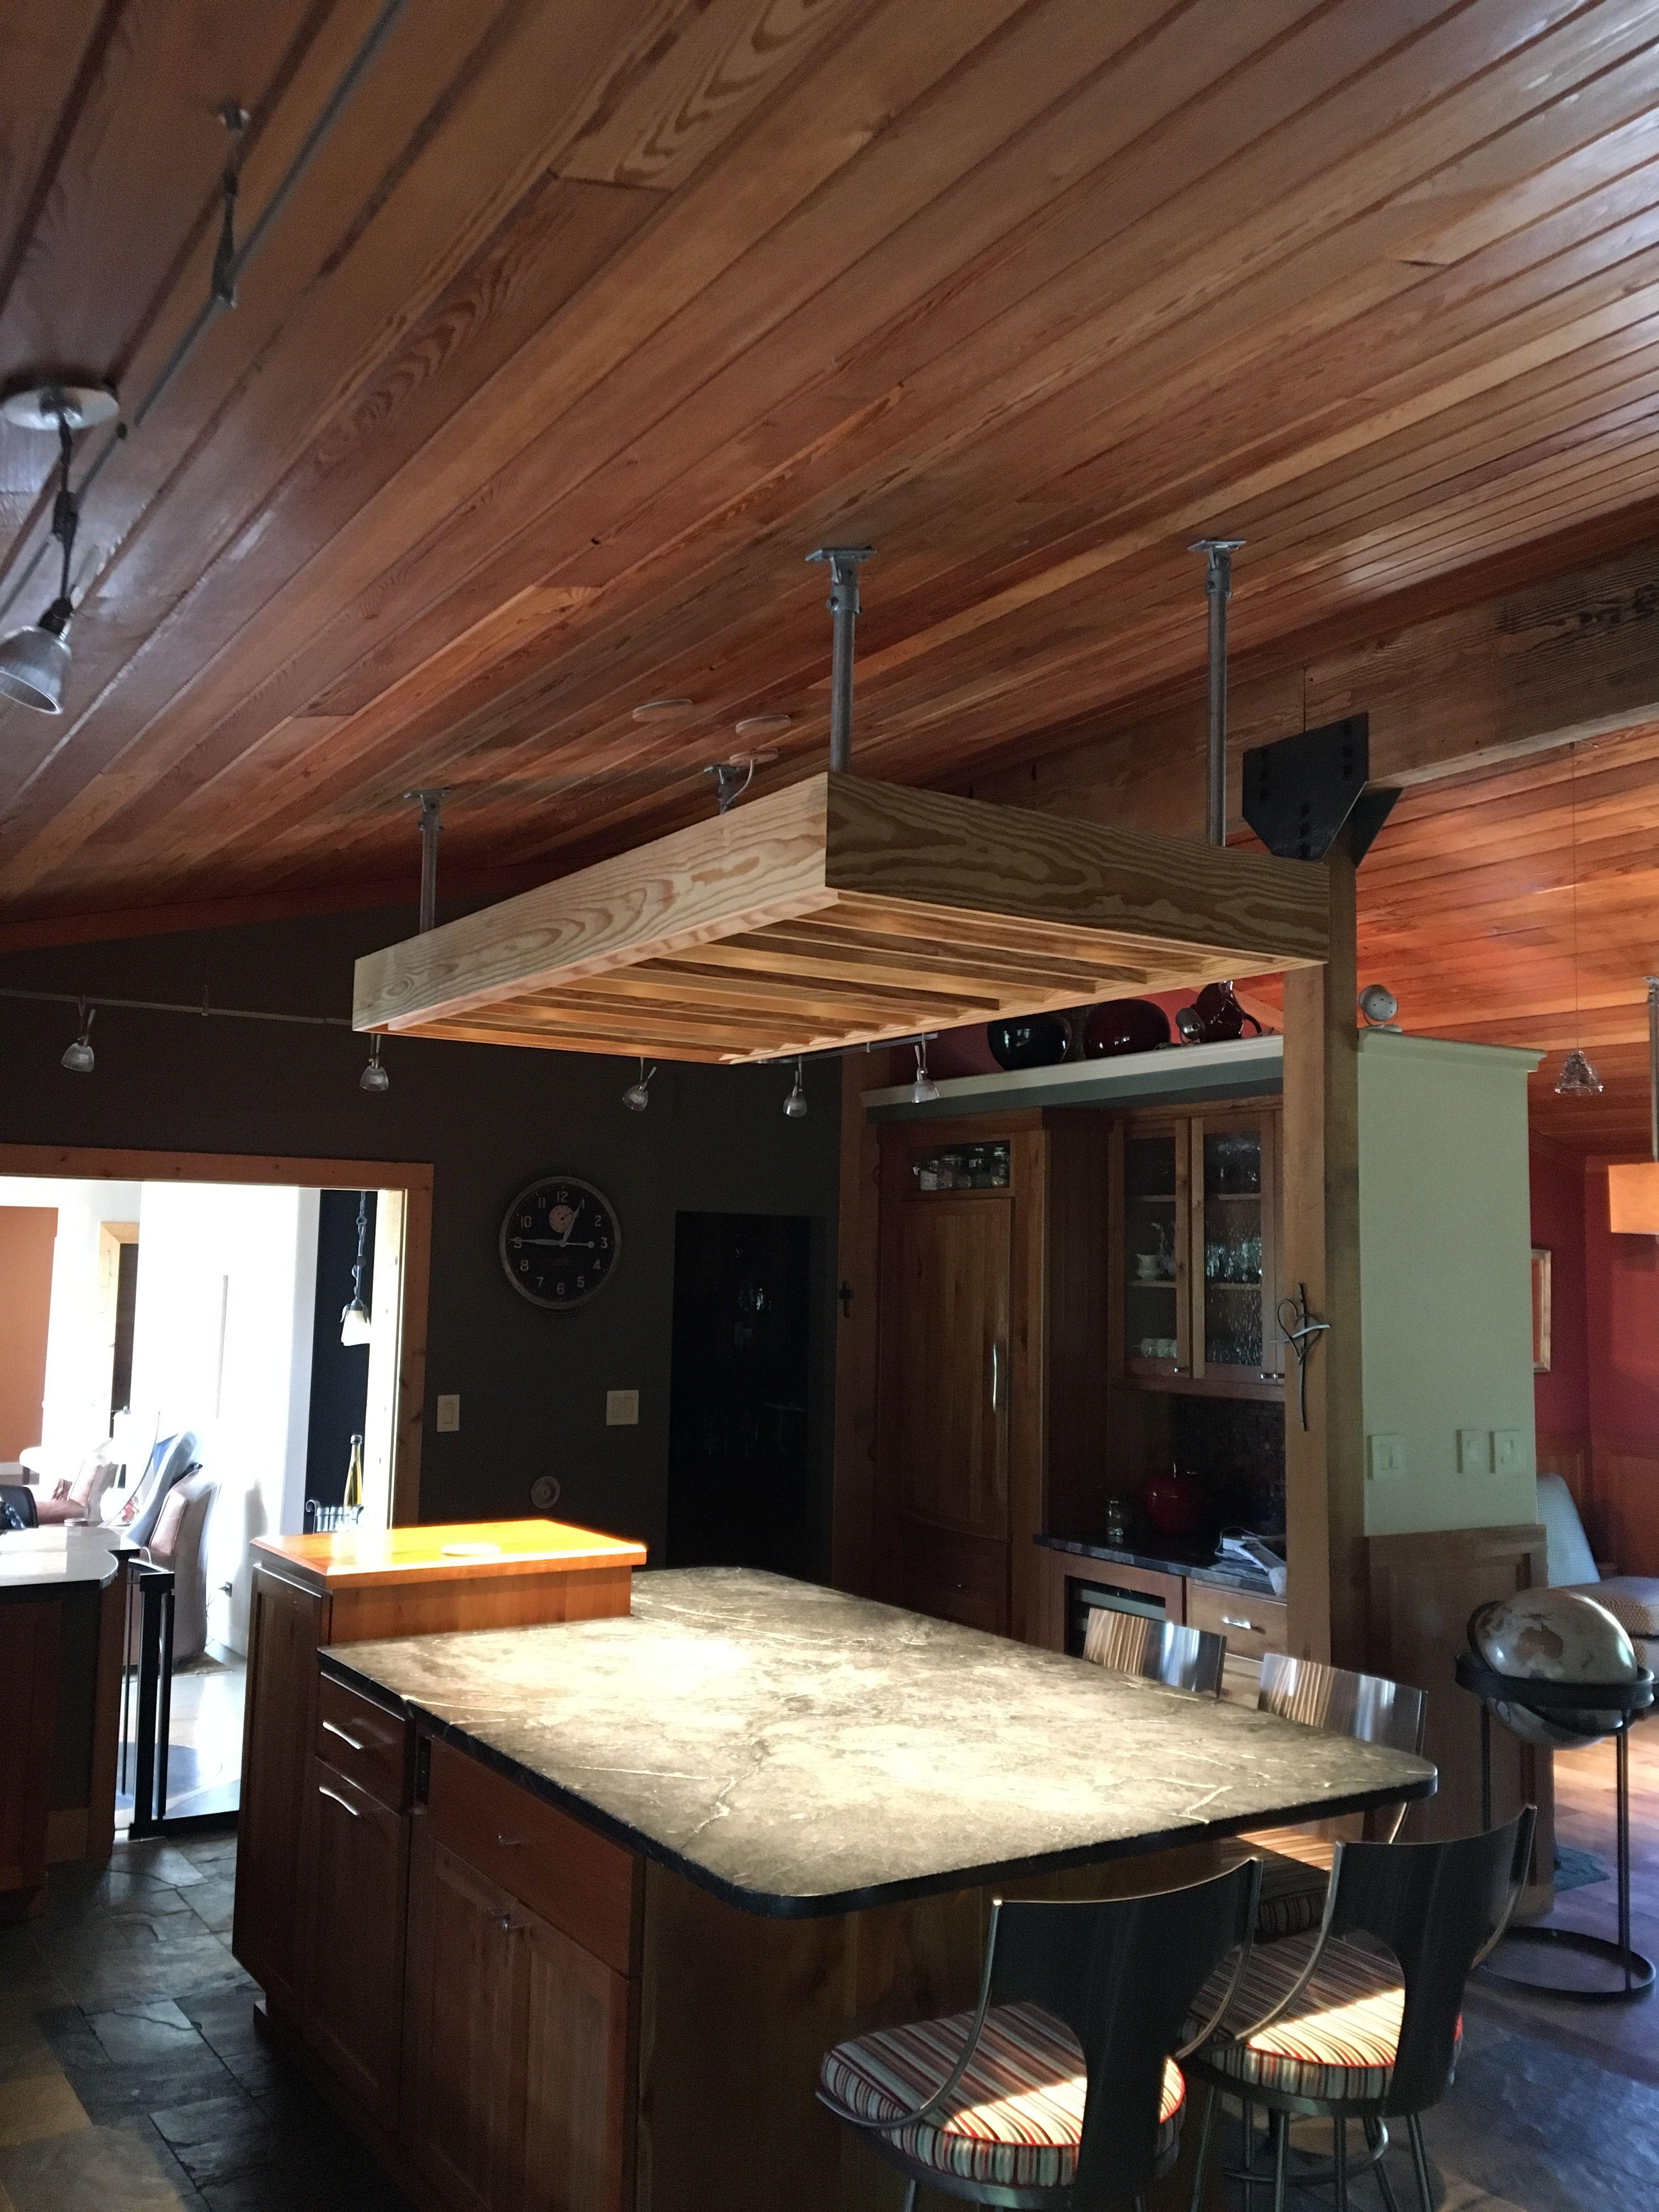 Pin By Wood Image On Wood Image Creations Kitchen Island Lighting Diy Light Fixtures Diy Kitchen Island